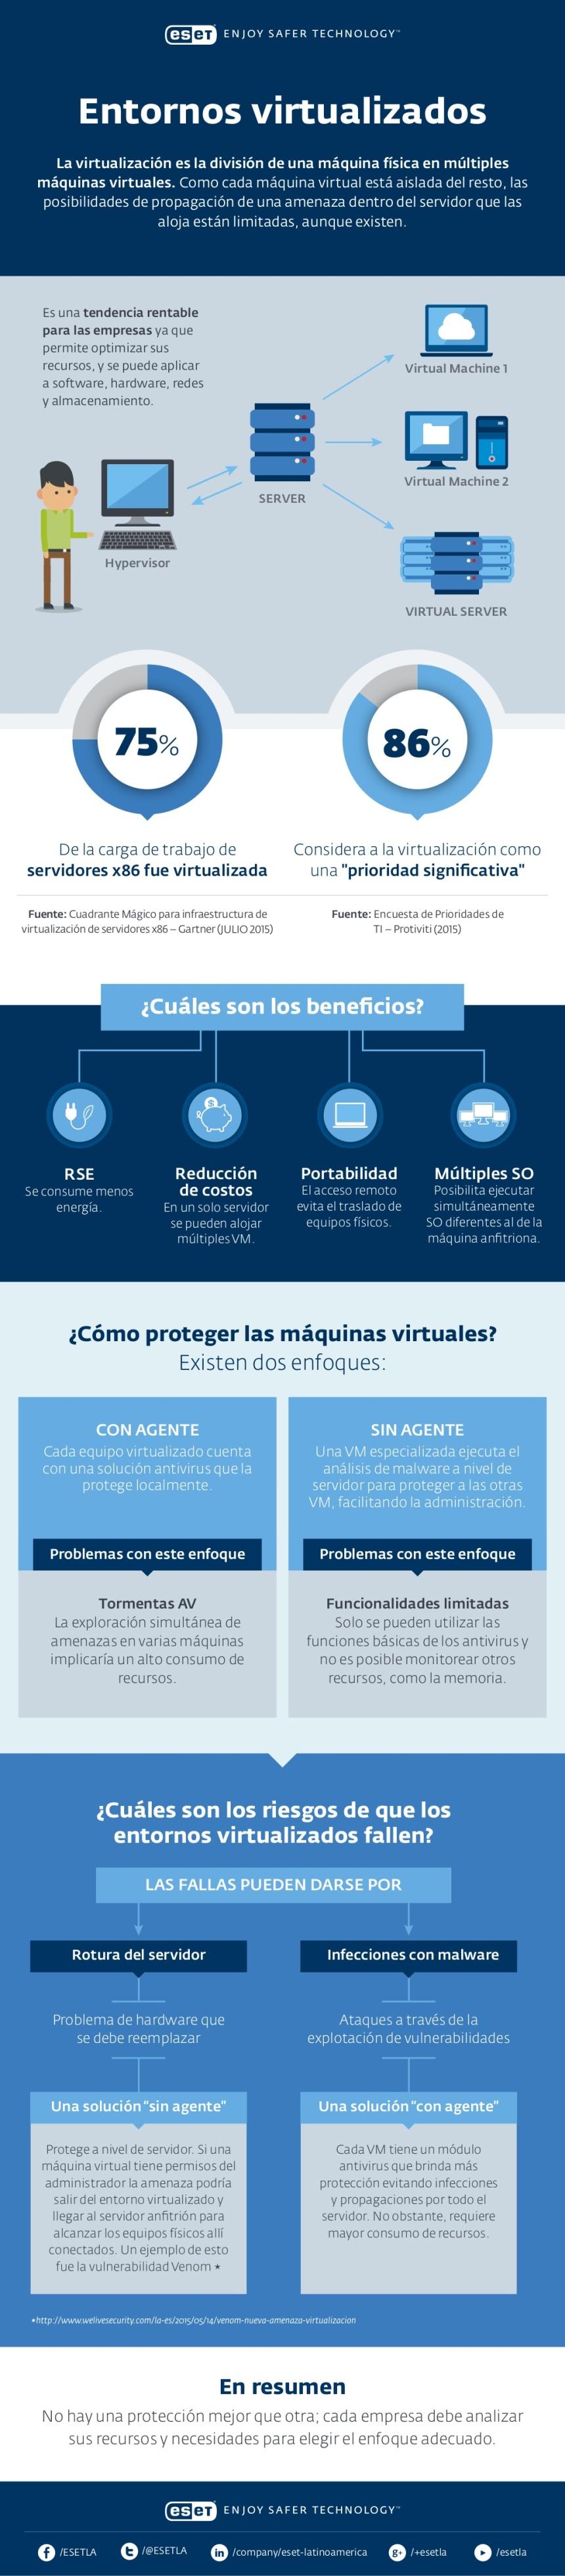 entornos-virtualizados-infografia